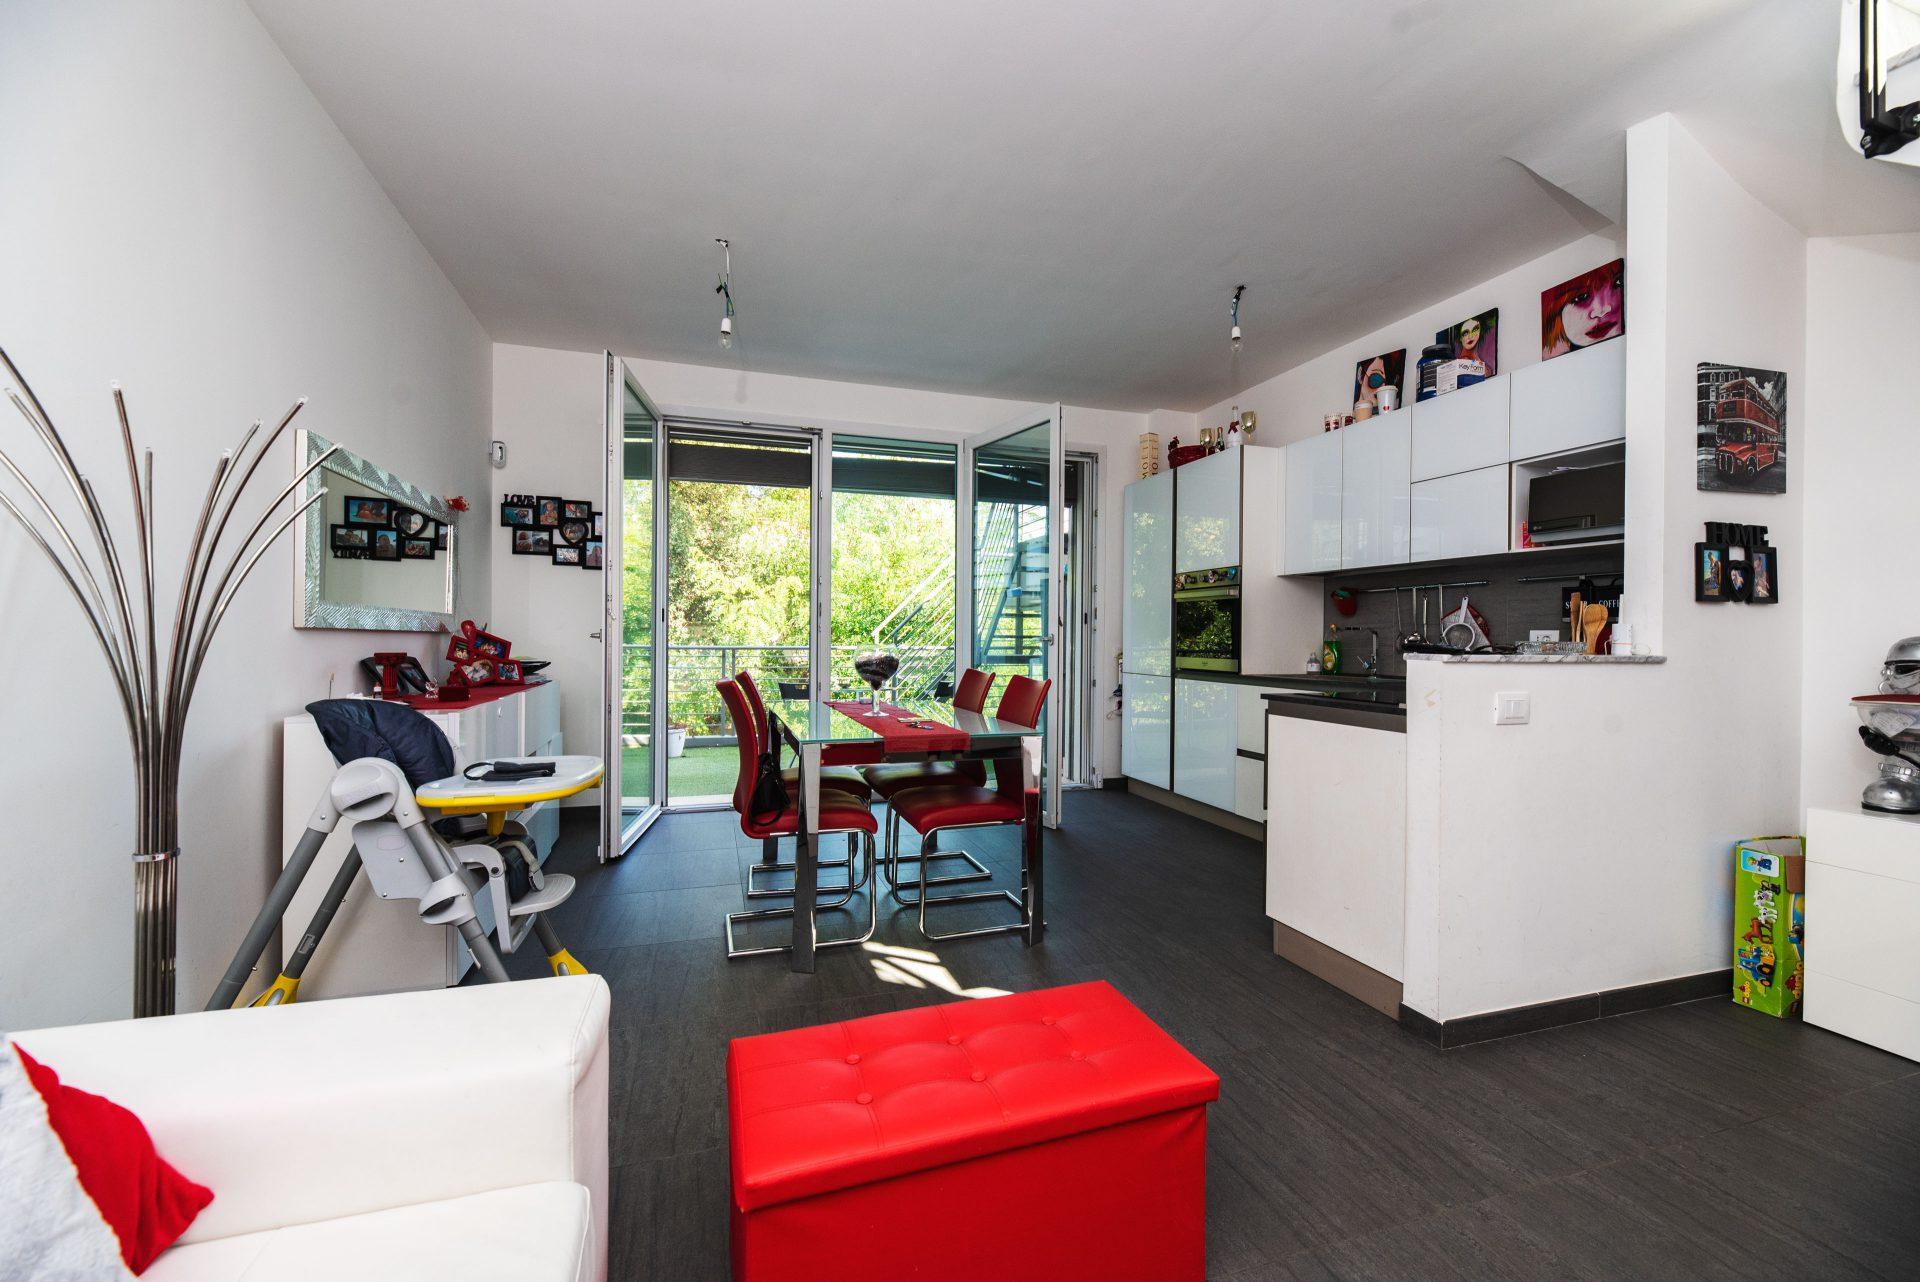 Vendita appartamento Boccea